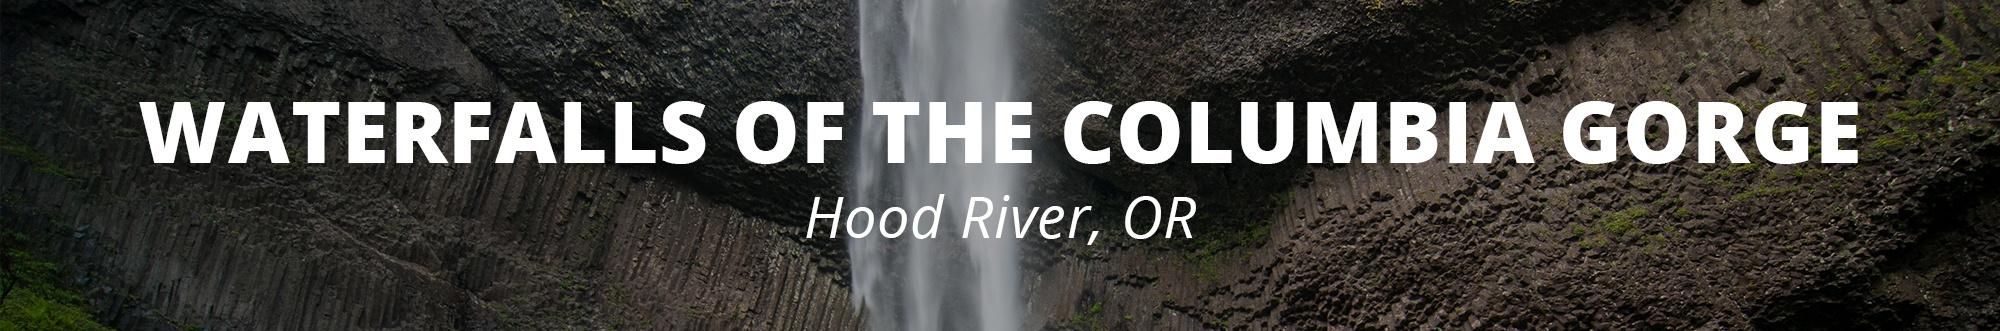 Waterfalls of the Columbia Gorse